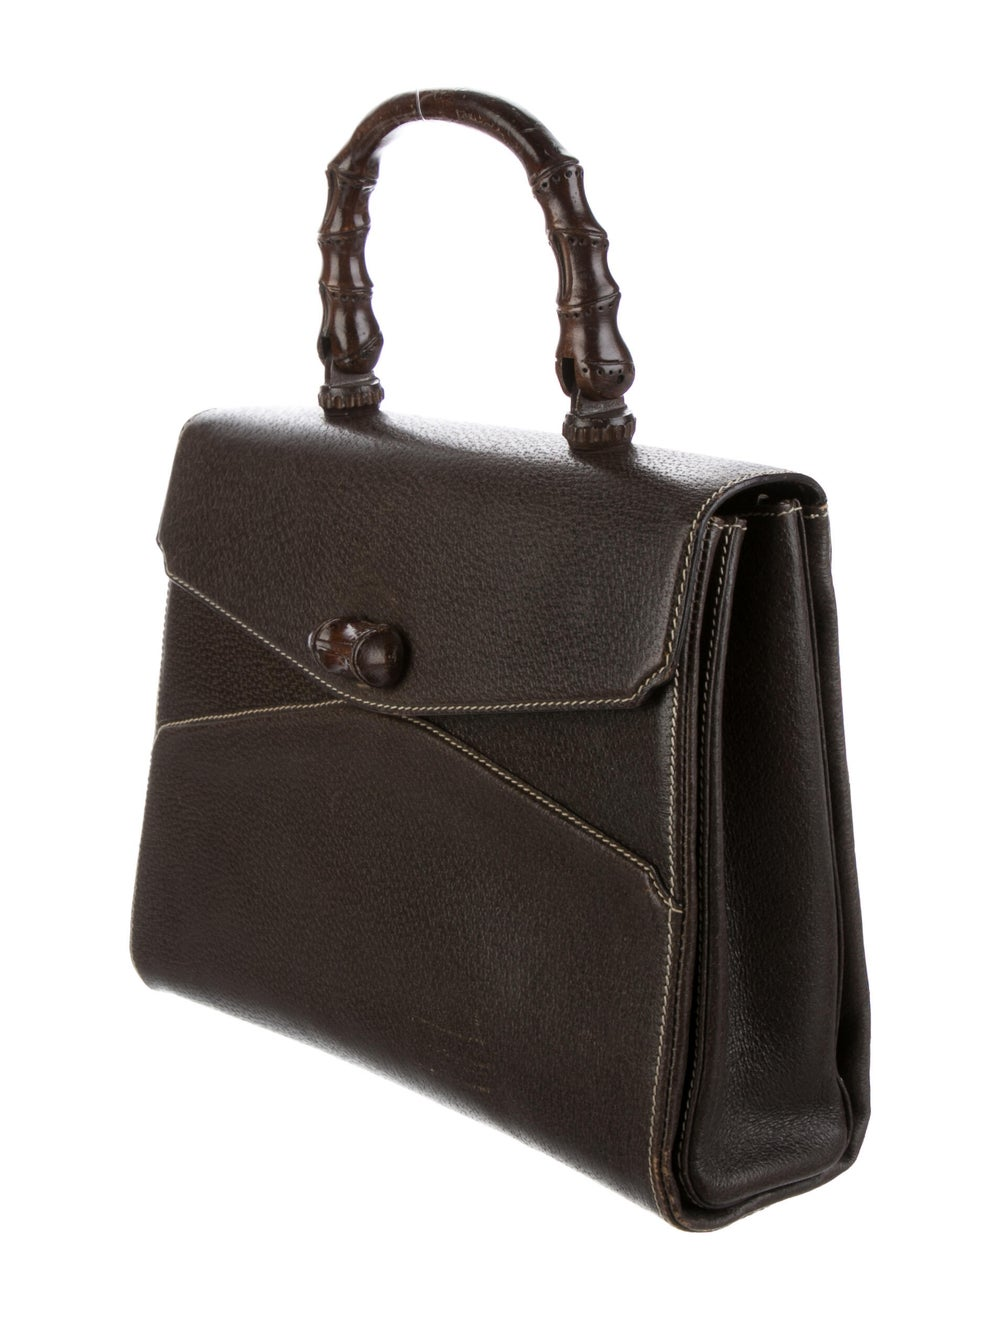 Gucci Vintage Bamboo Handle Bag Brown - image 2